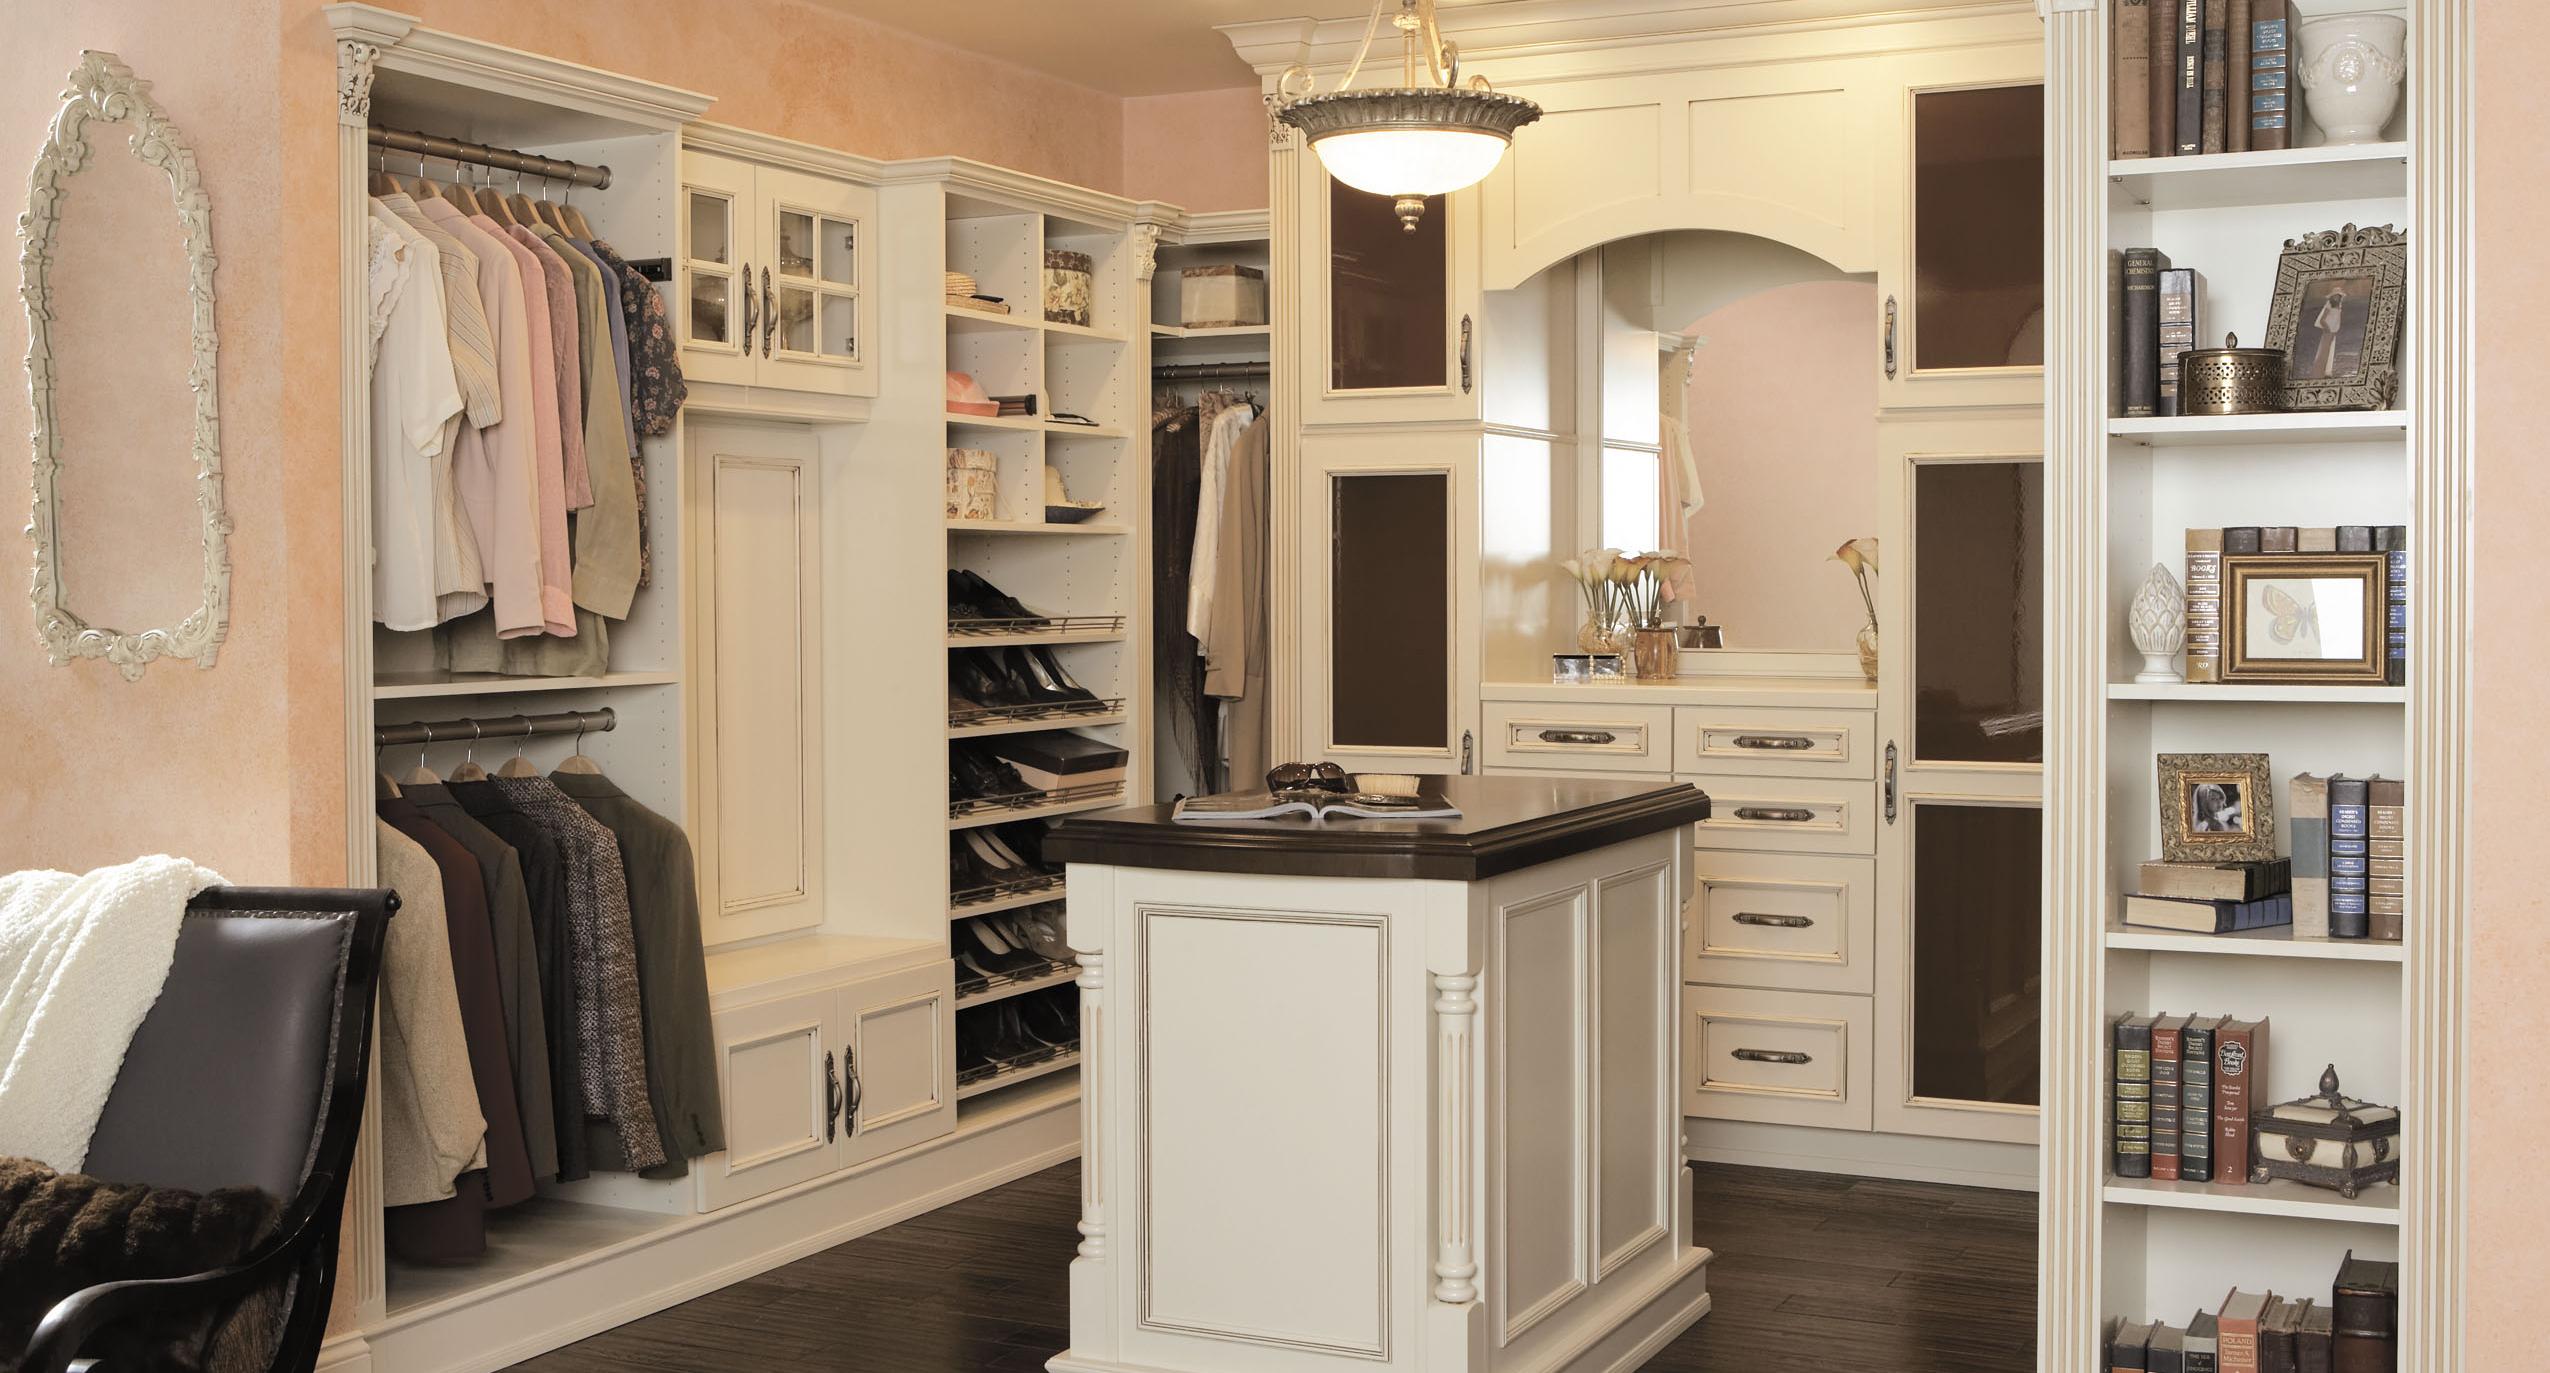 BarrWood Cabinets 13